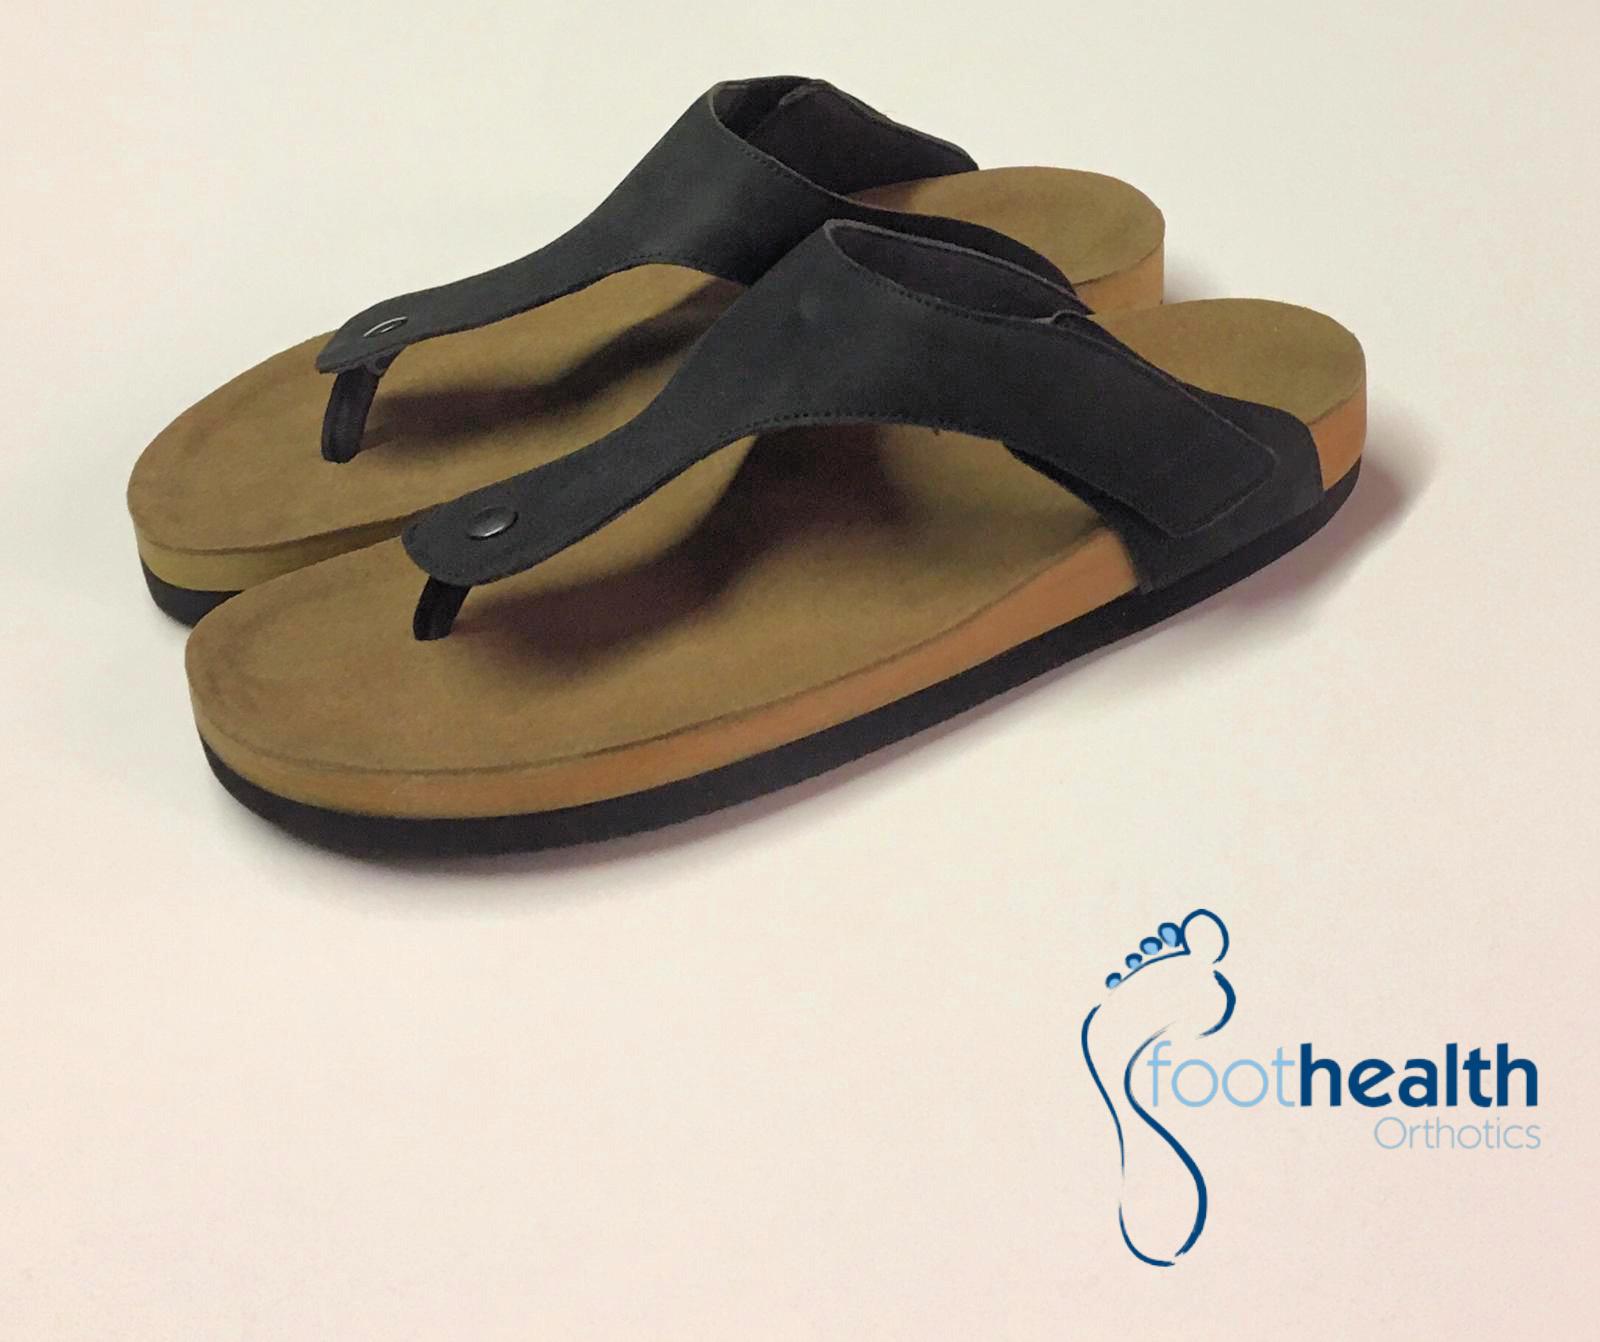 Bespoke Insoles, Flip Flops and Sandals 4